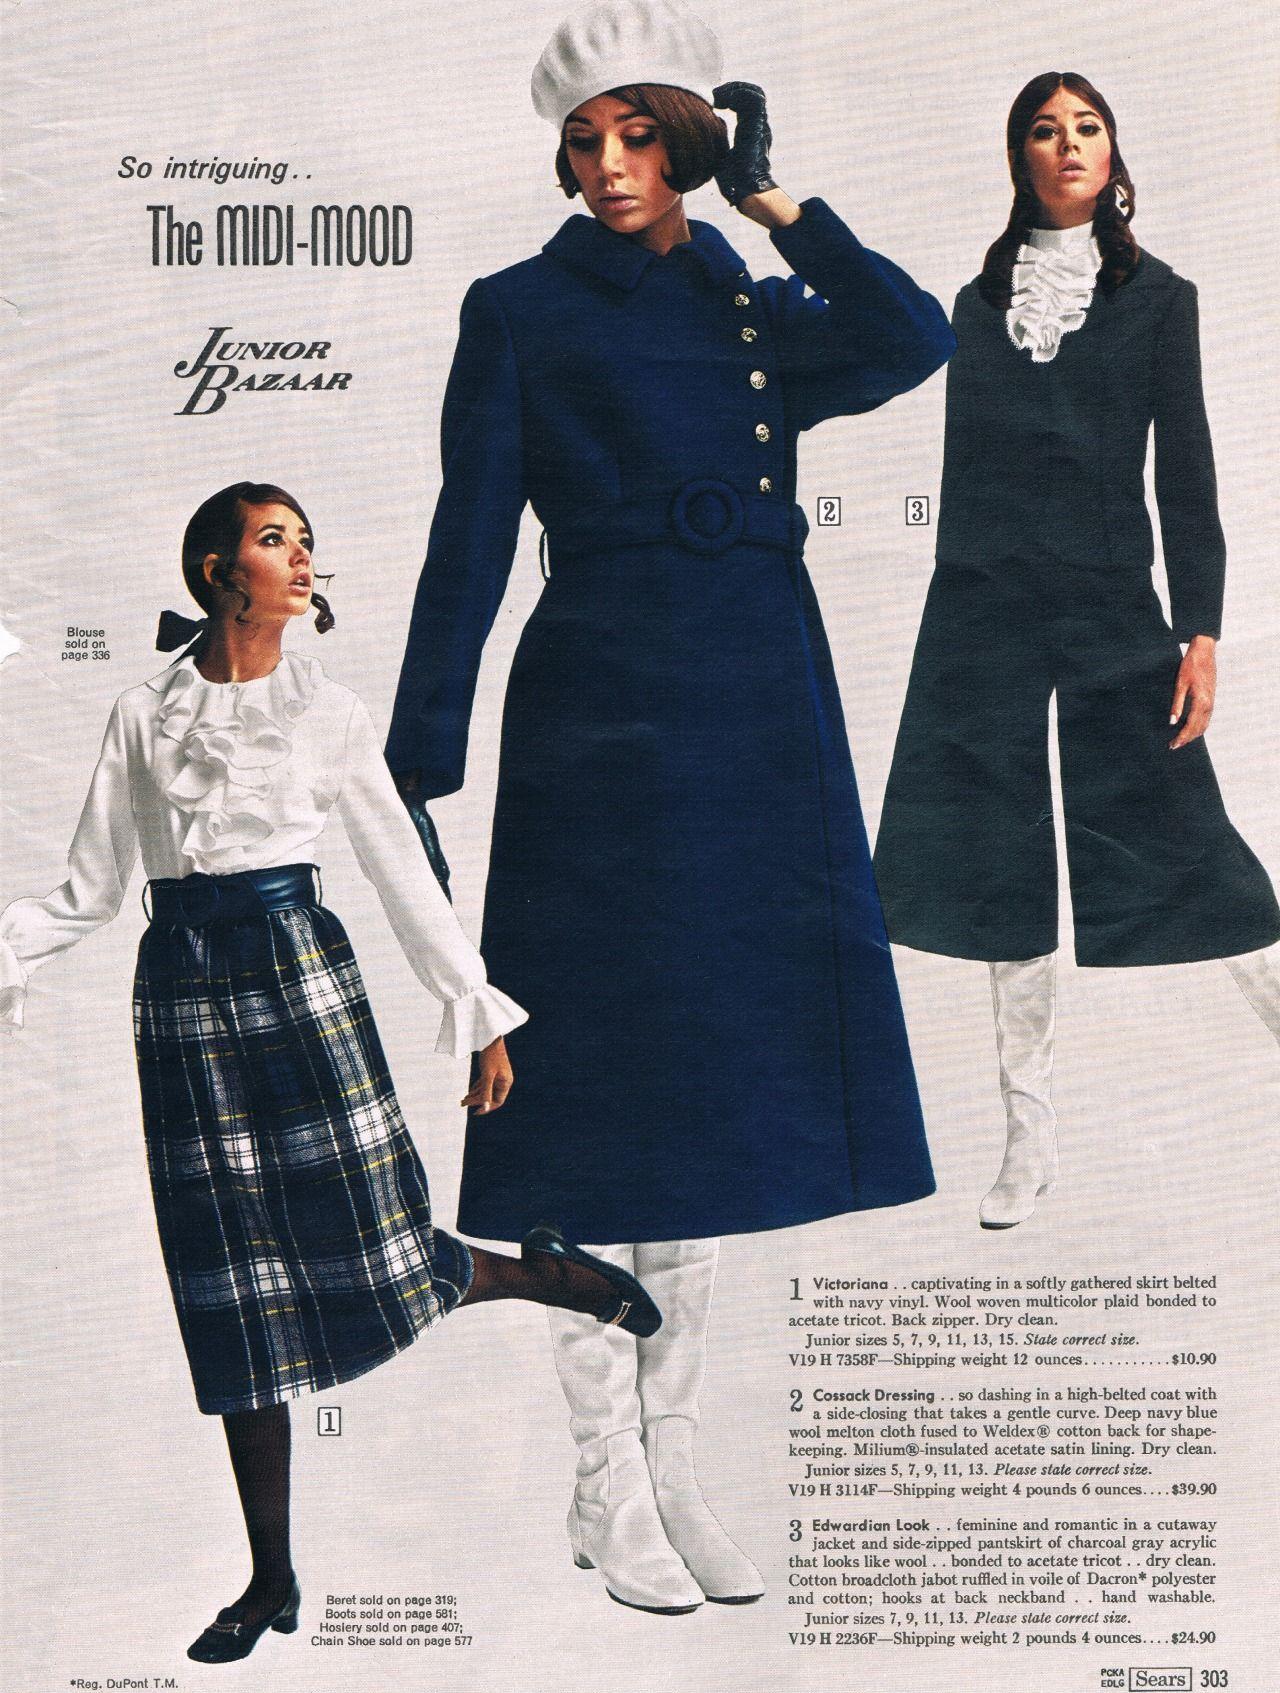 Colleen corby modelando dentro del catálogo americano sears s